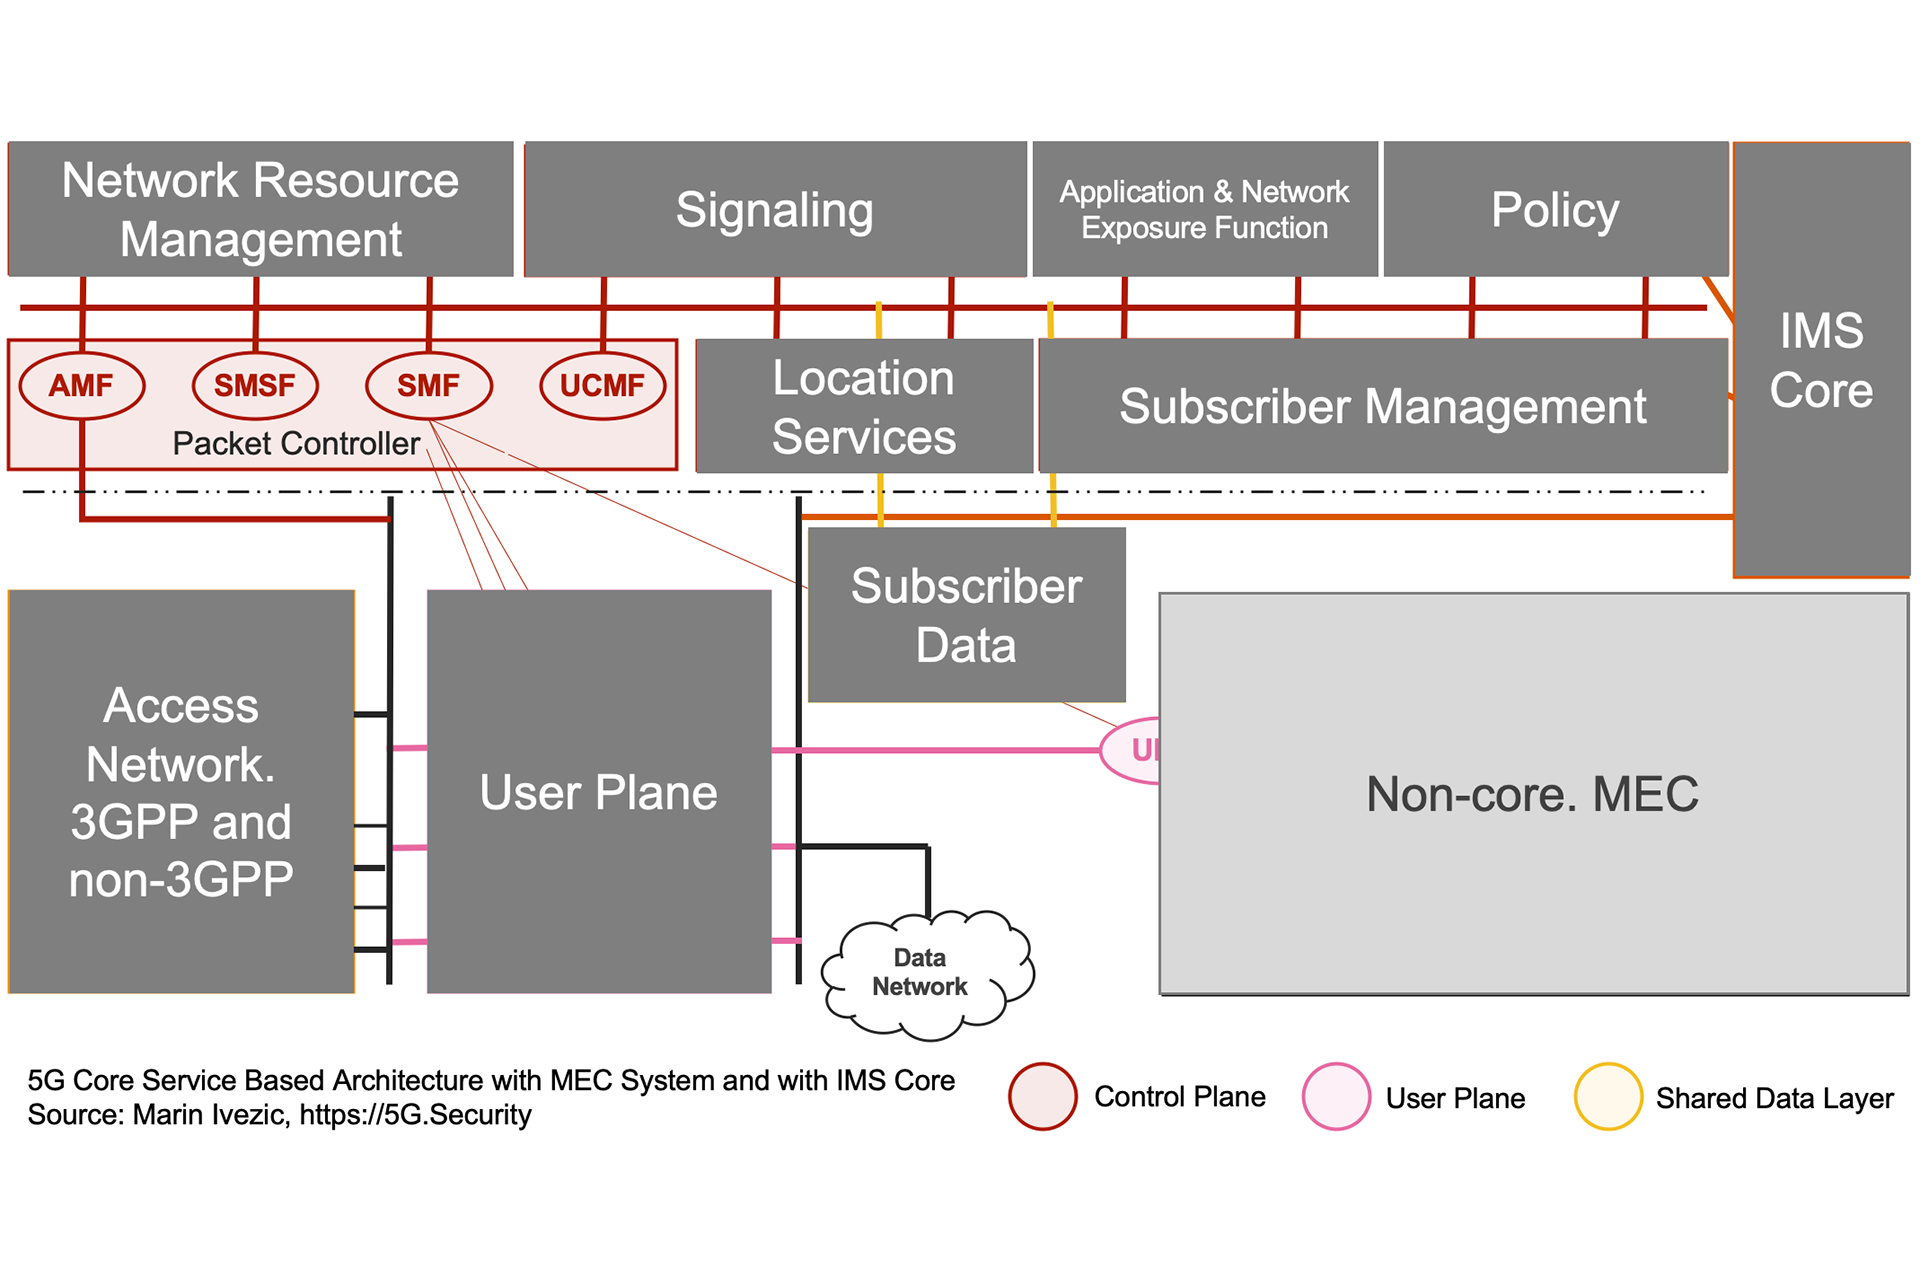 5G SBA IMS MEC Architecture - Control Plane